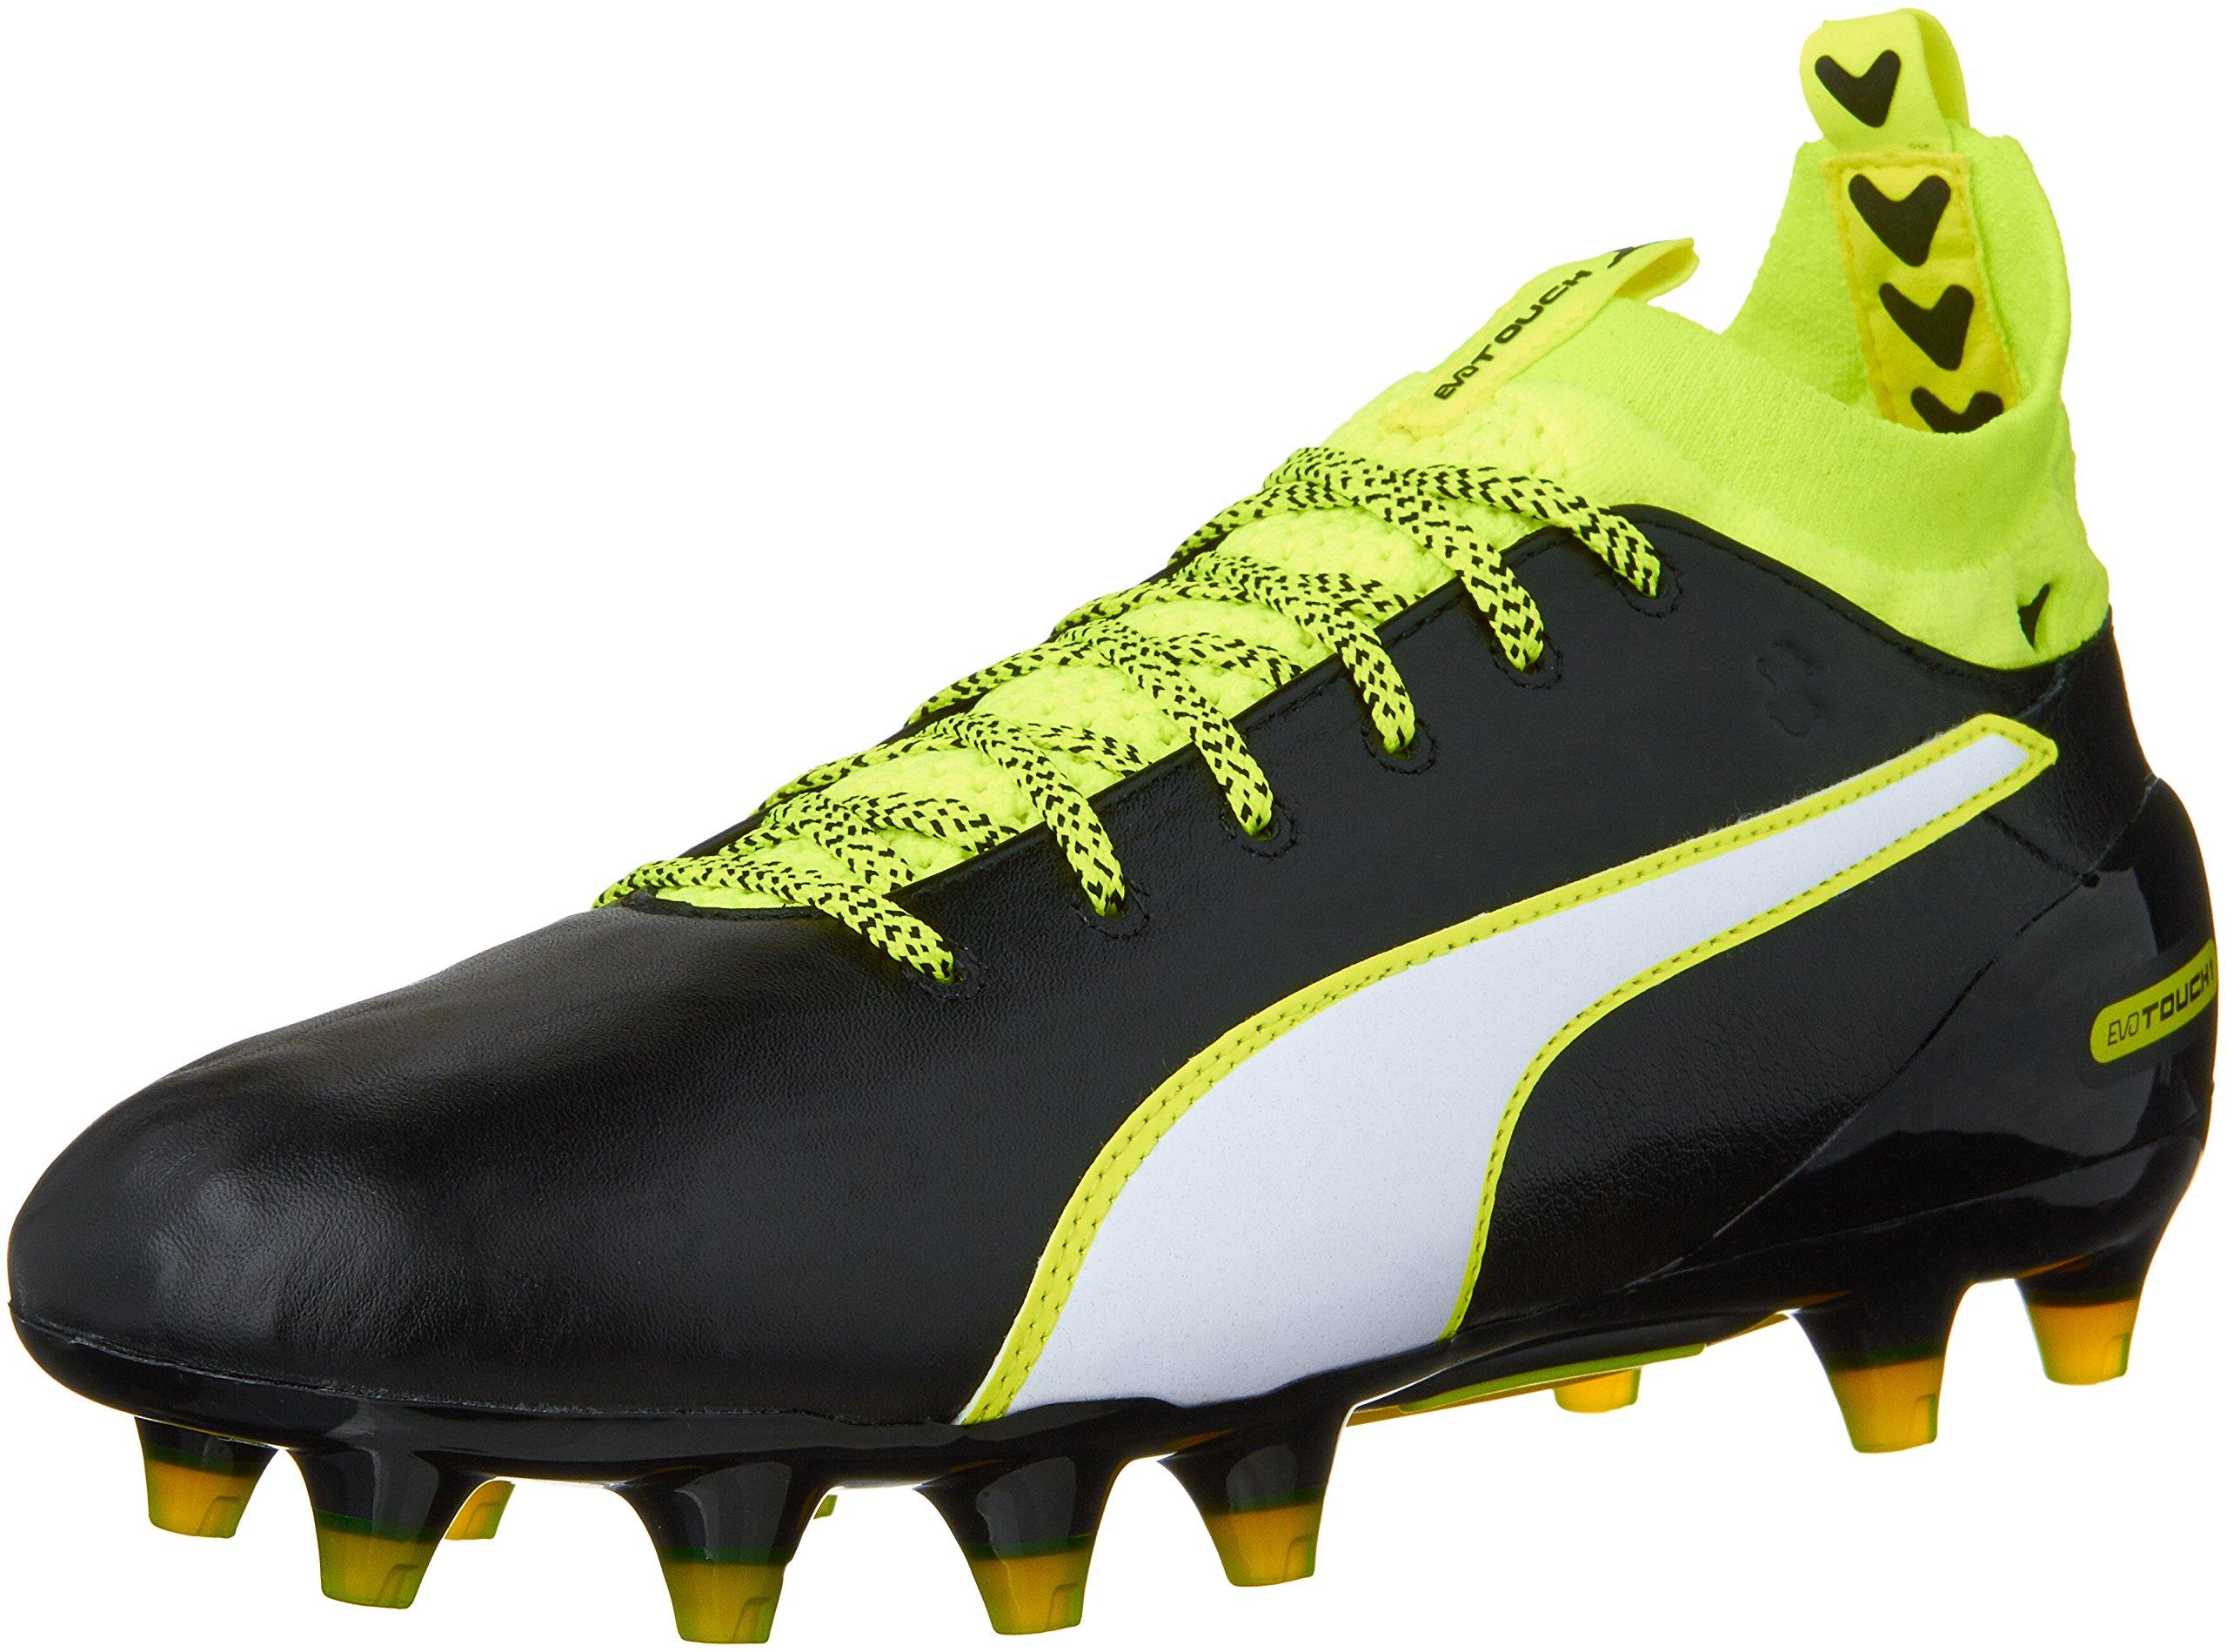 PUMA Men's Evotouch 1 FG Soccer Shoe, Black/White/Safety Grey, 10 M US by PUMA